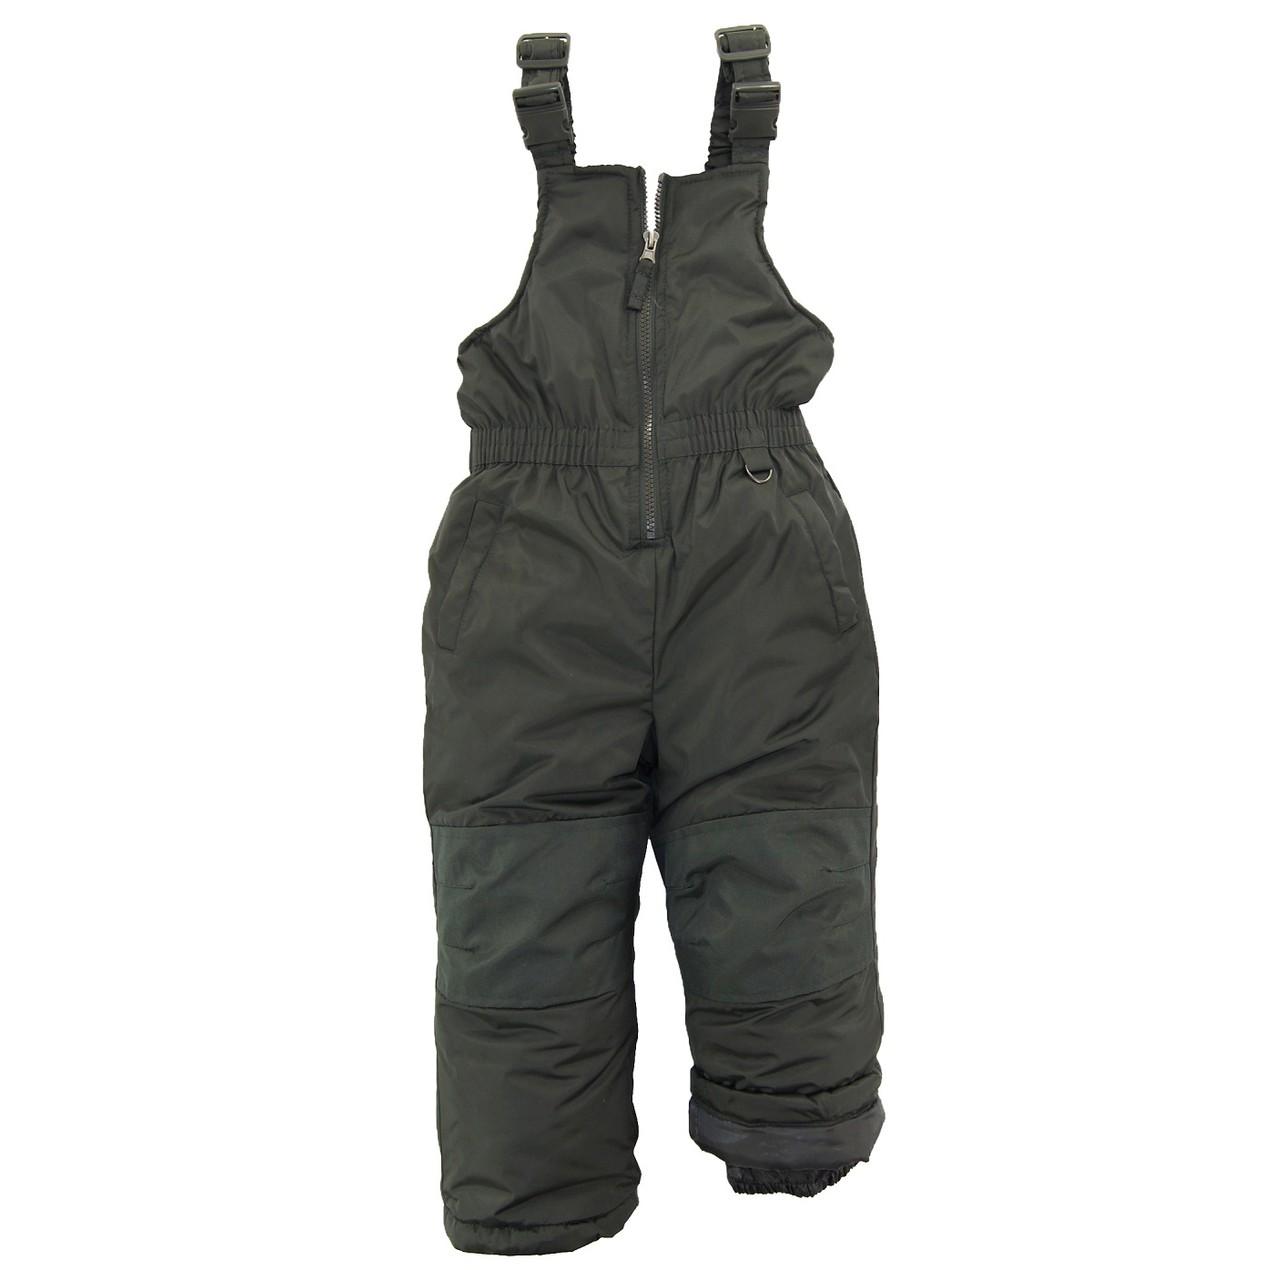 6f62f92be Ixtreme Boys Colorblock Heavy Snowsuit Winter Ski Jacket Bib Bonus ...